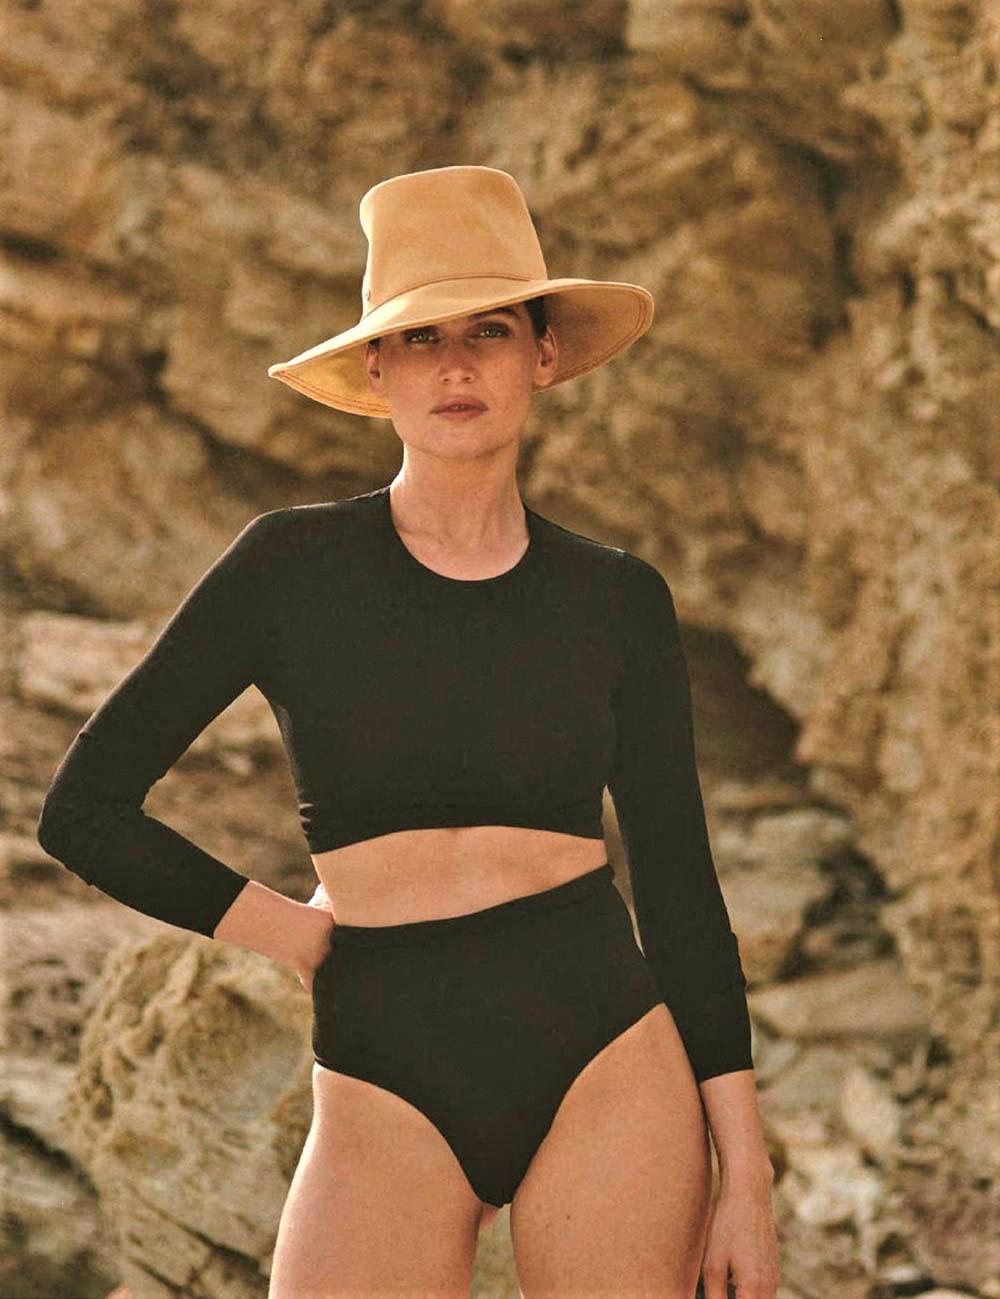 Laetitia-Casta-covers-Elle-France-July-19th-2019-by-Blair-Getz-Mezibov-8.jpg